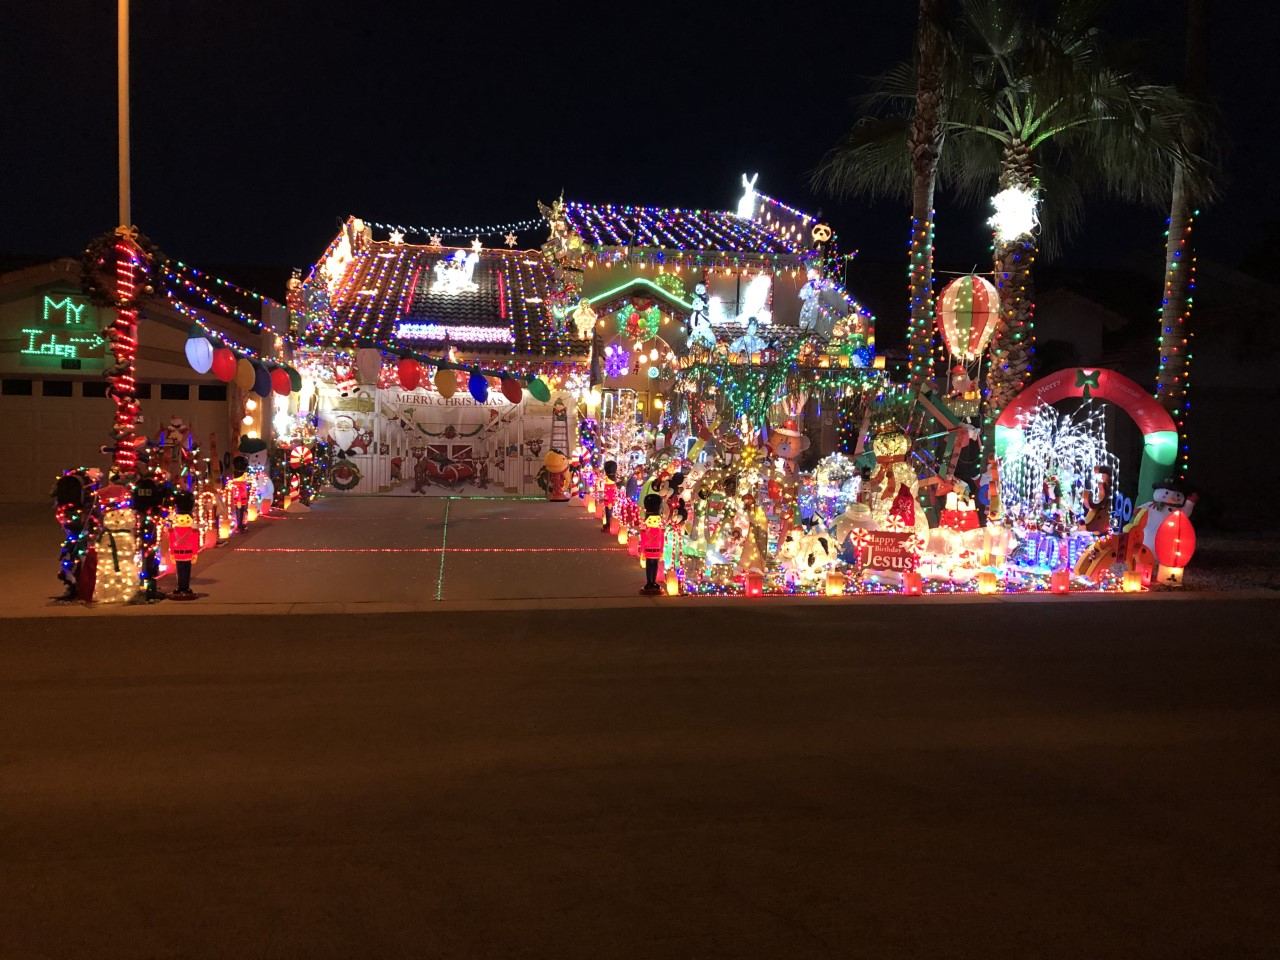 Danny Dingman Christmas house